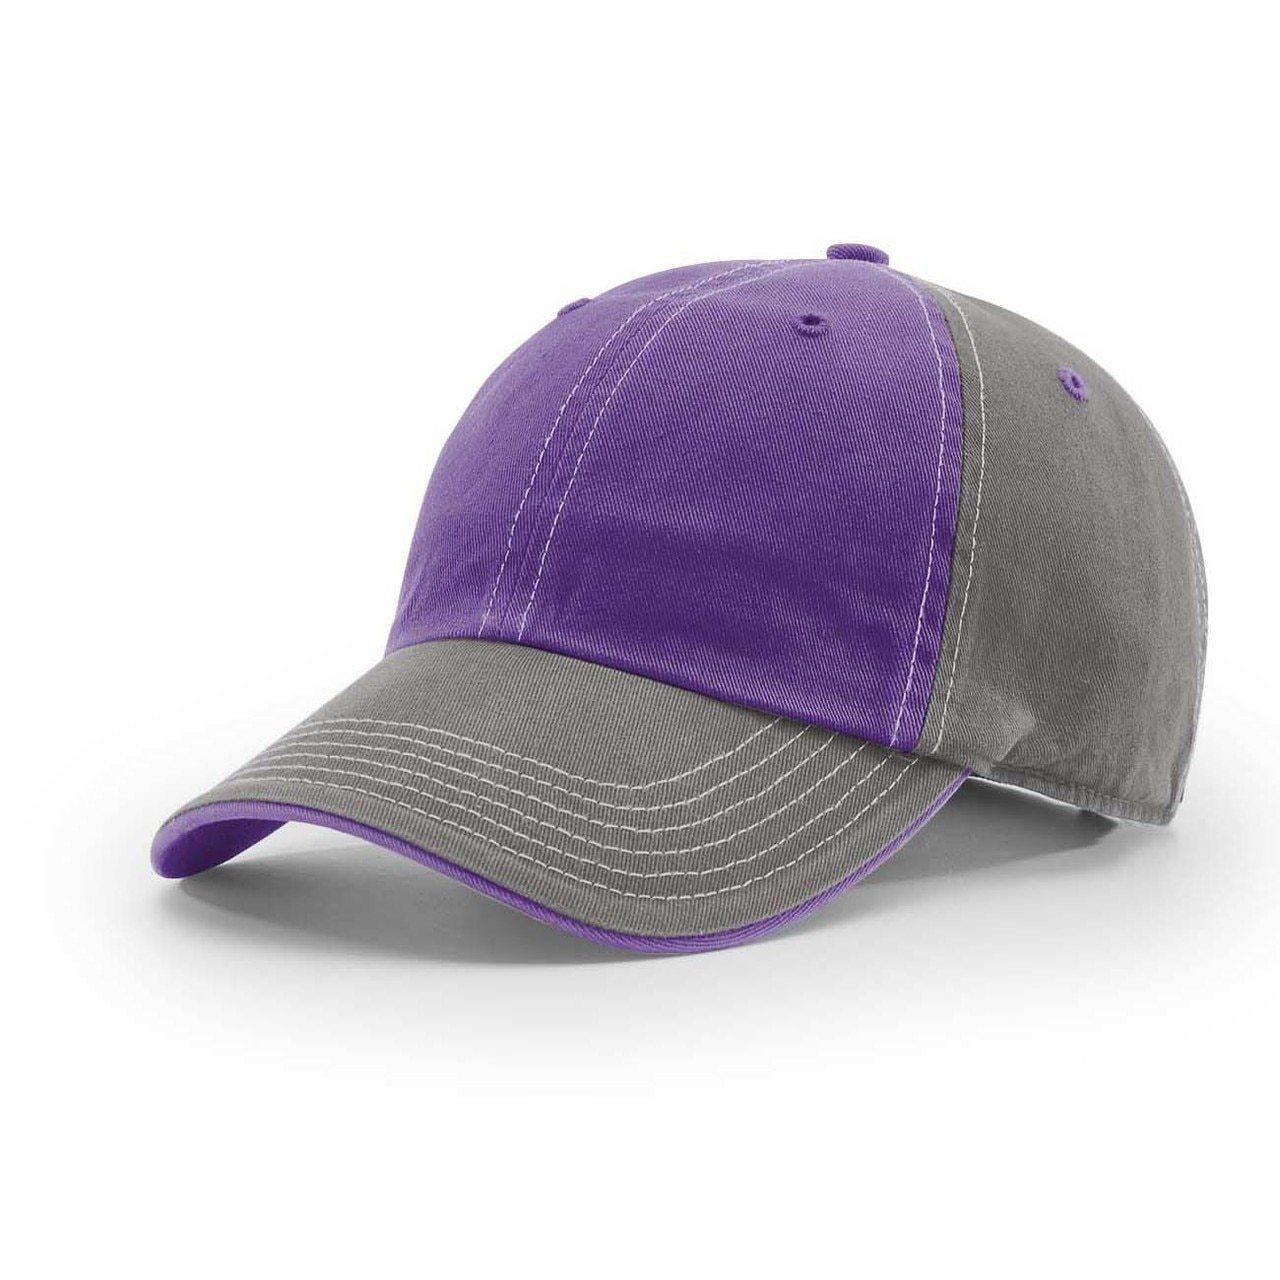 e098596ea6804 Wholesale - Richardson - Lifestyle - Page 1 - The Hat Pros